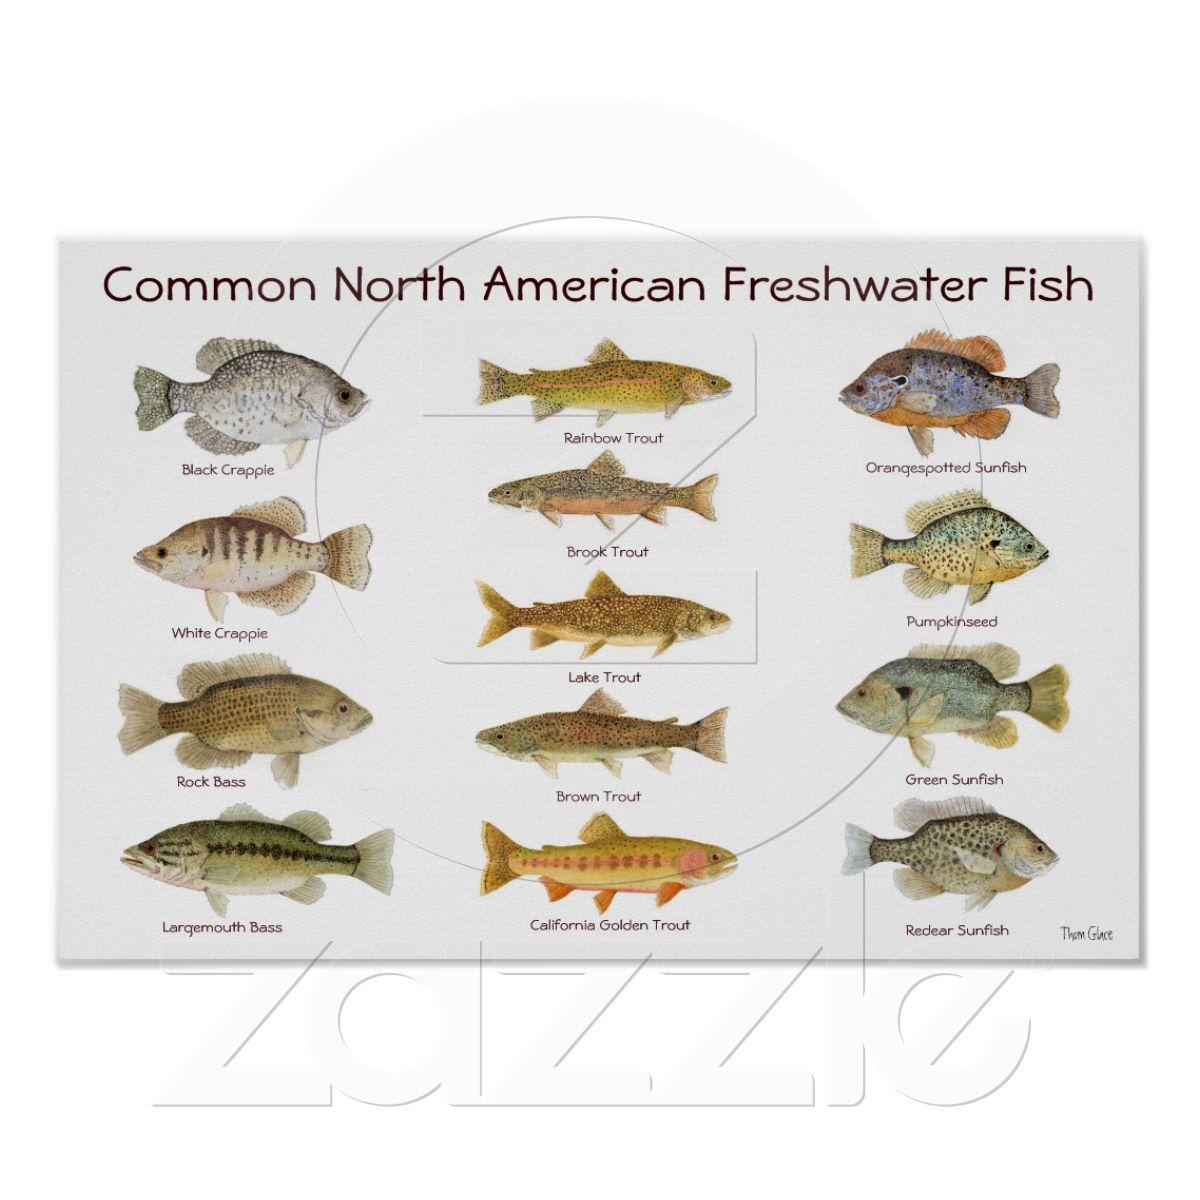 Freshwater fish anatomy - Freshwater Fish Poster